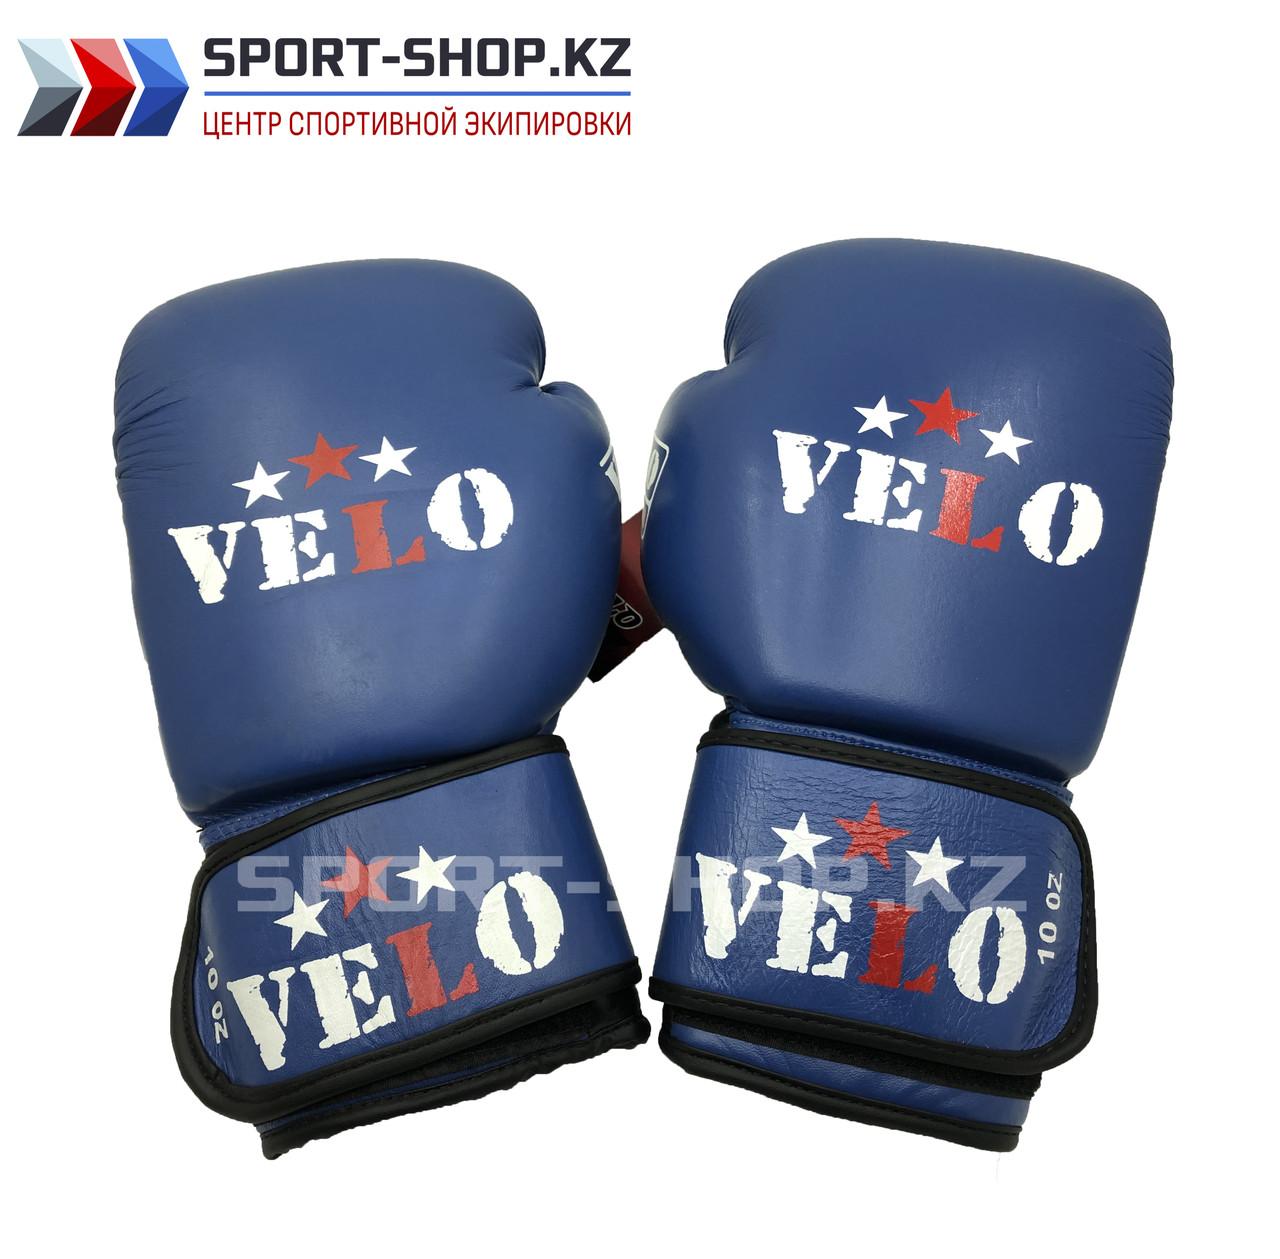 Боксерские перчатки VELO